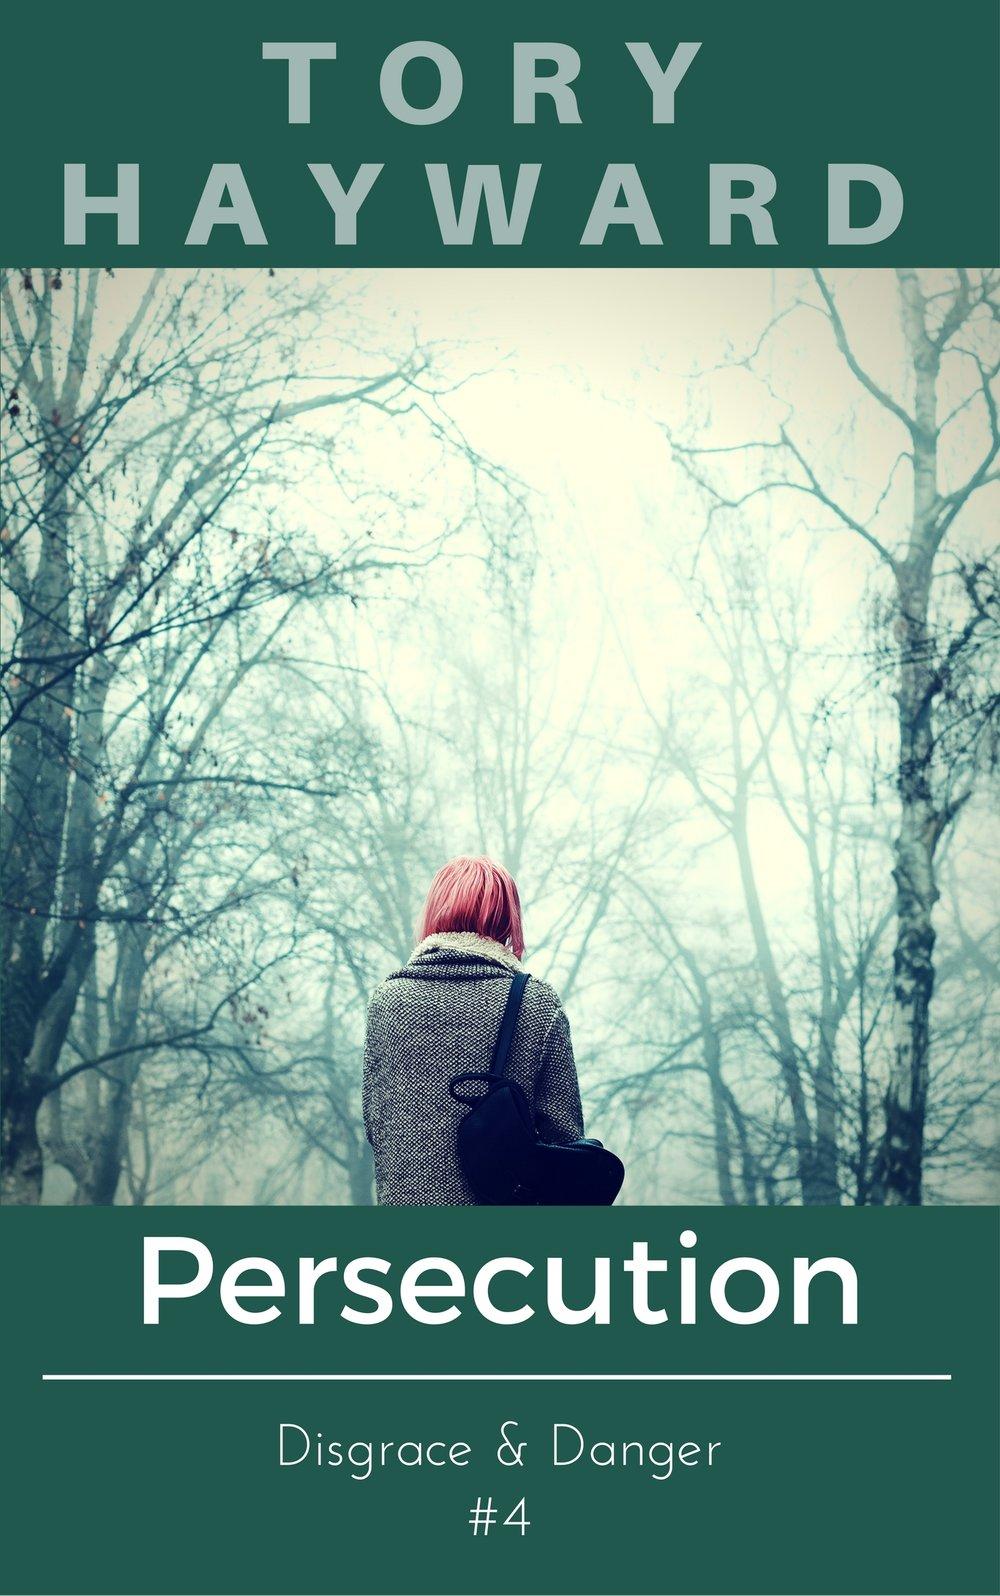 Disgrace & Danger #4: Persecution